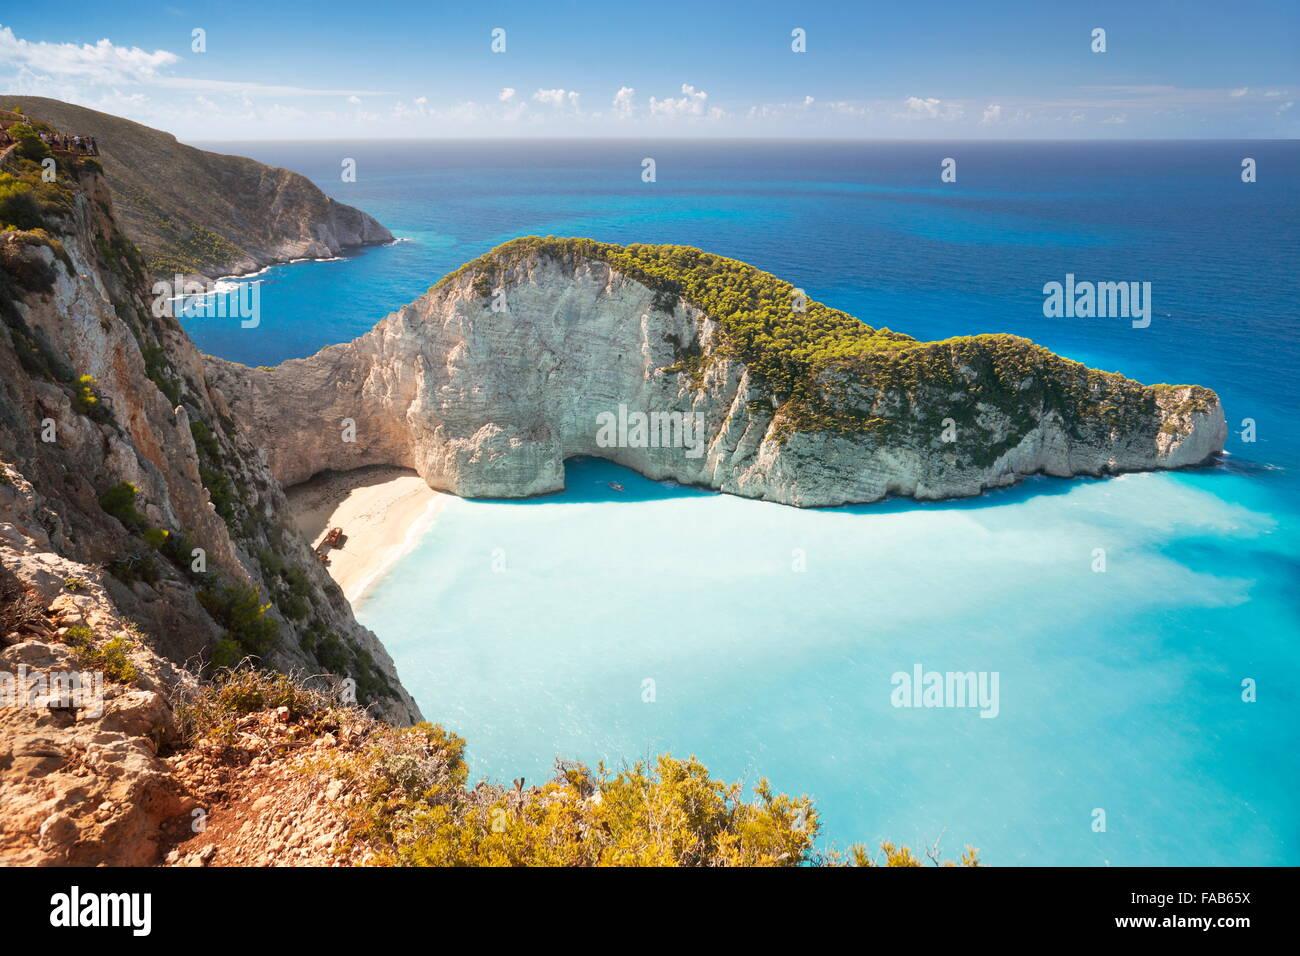 Greece - Zakynthos, Shipwreck Cove, Navagio Beach - Stock Image